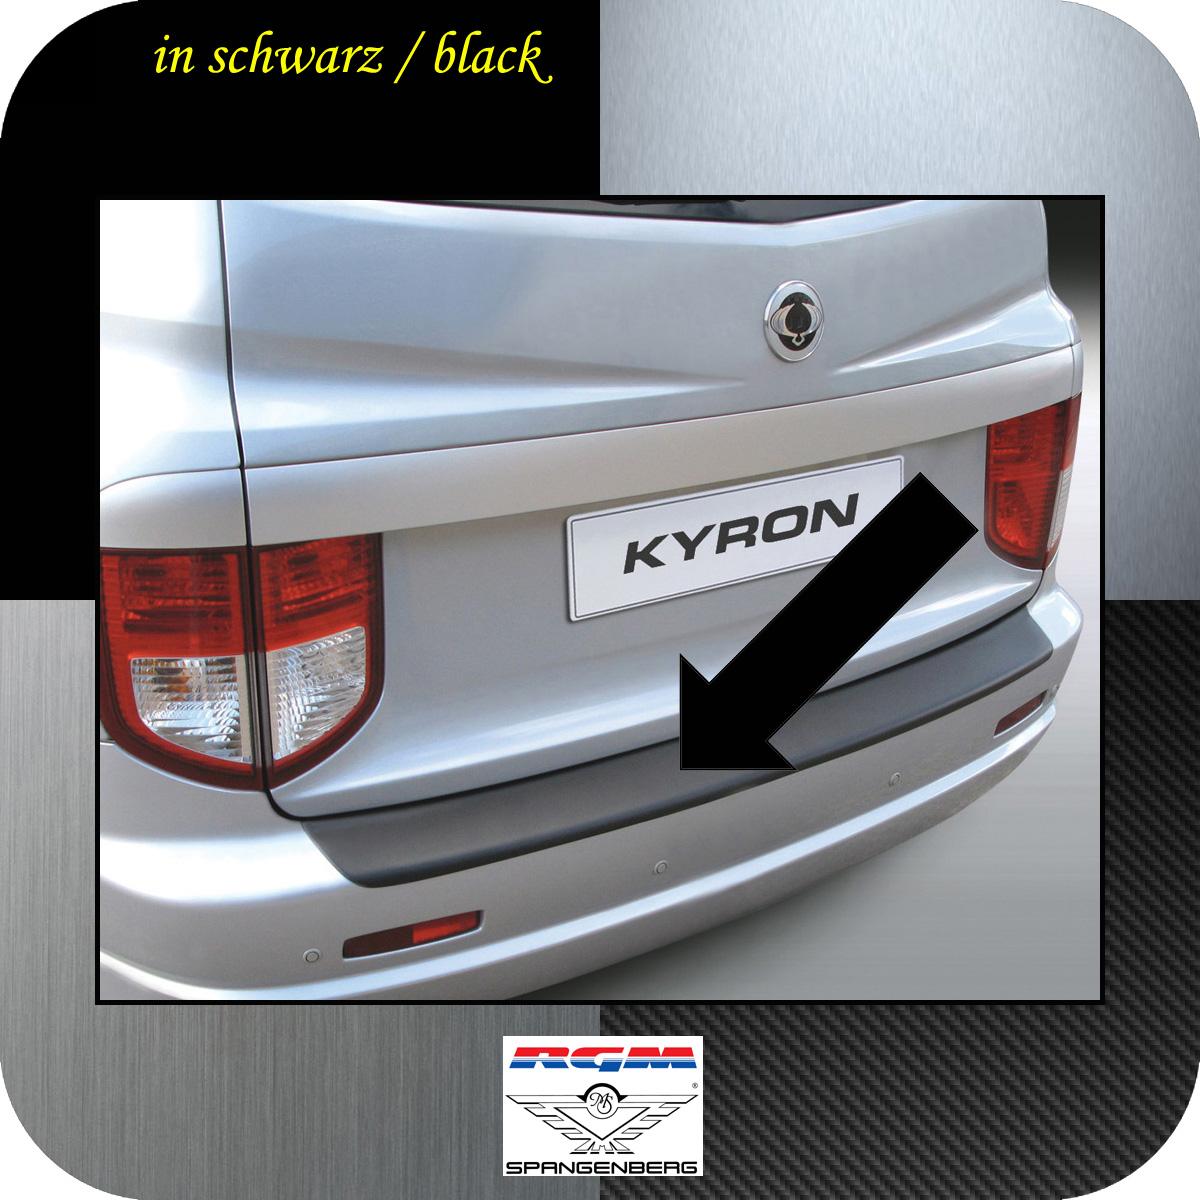 Ladekantenschutz schwarz SsangYong Kyron SUV vor facelift 2005-2007 3500150